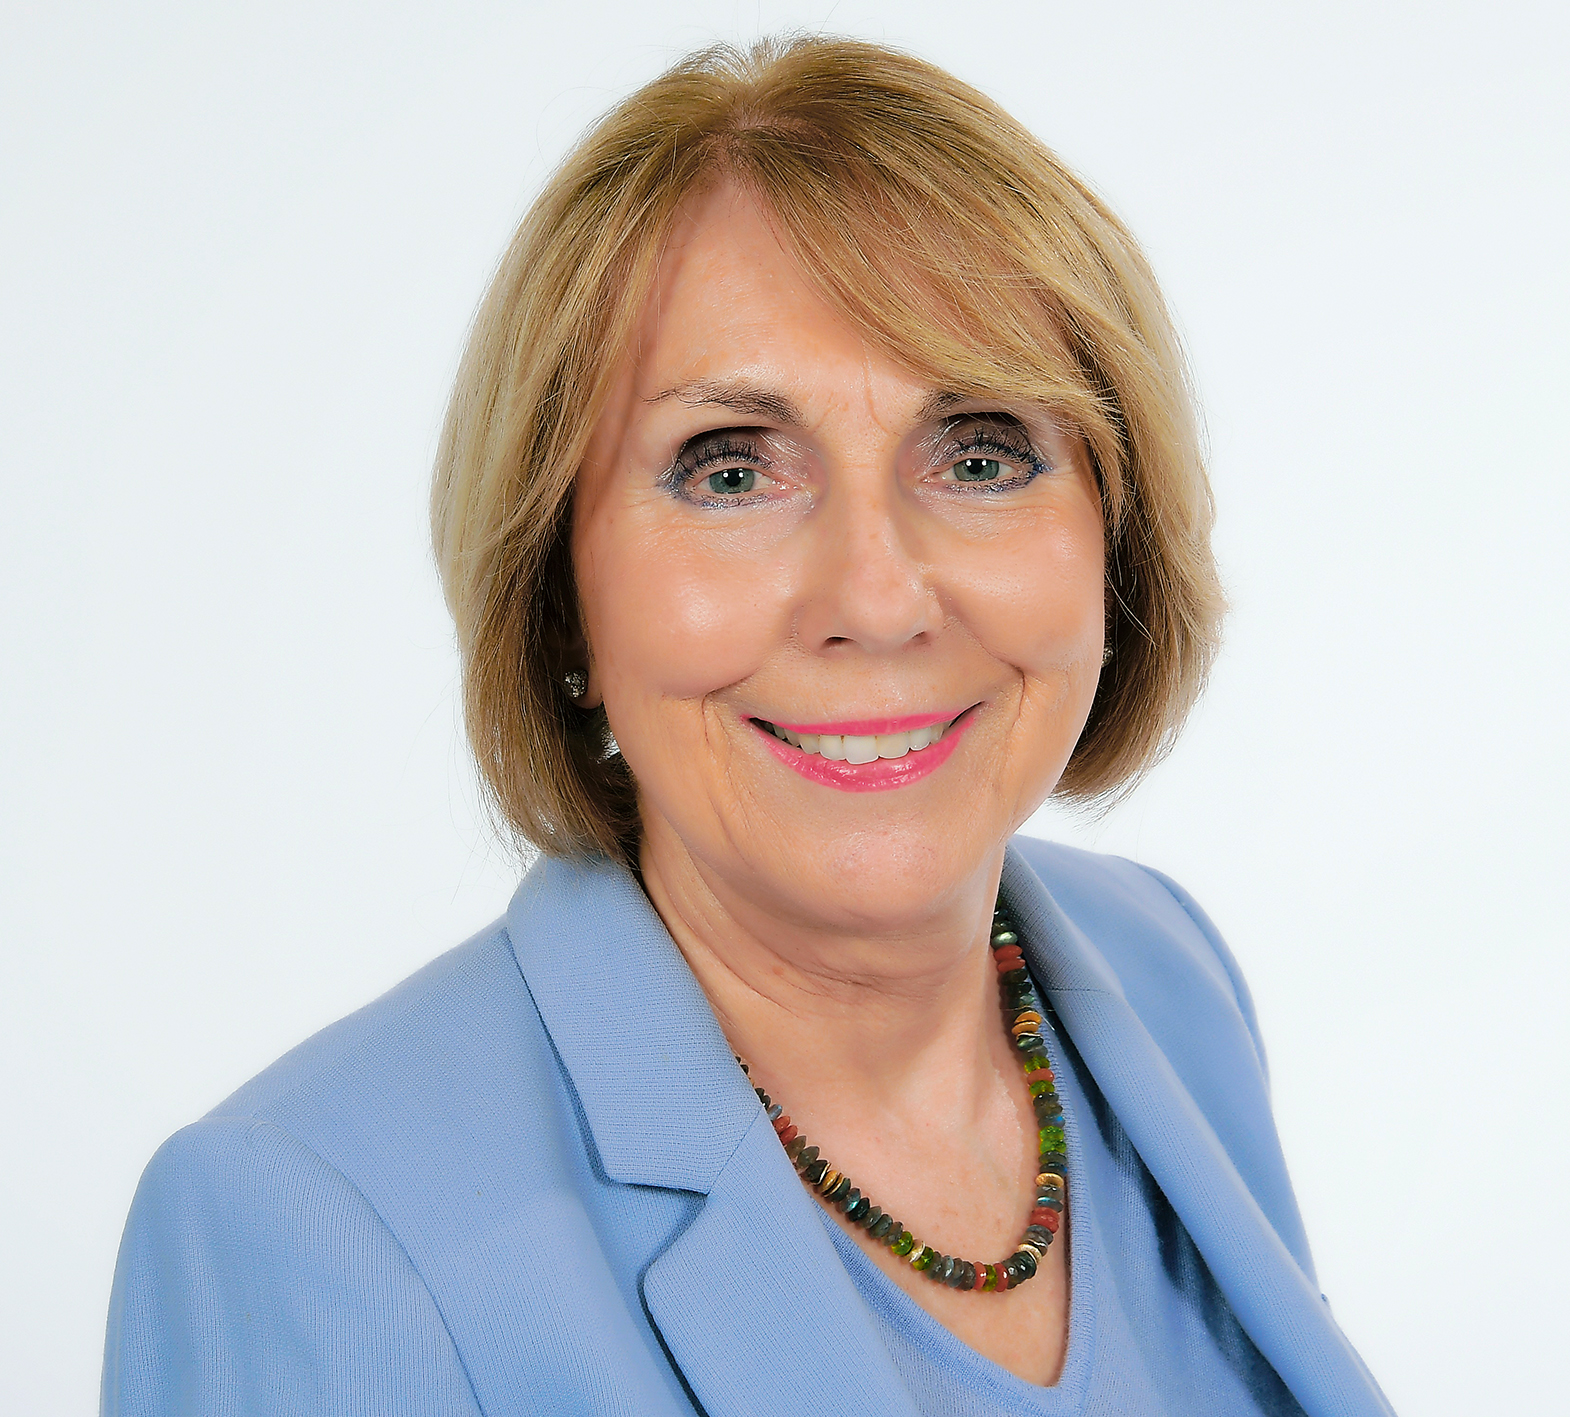 Stadtverordnete CDU-Fraktion Frankfurt Christiane Loizides